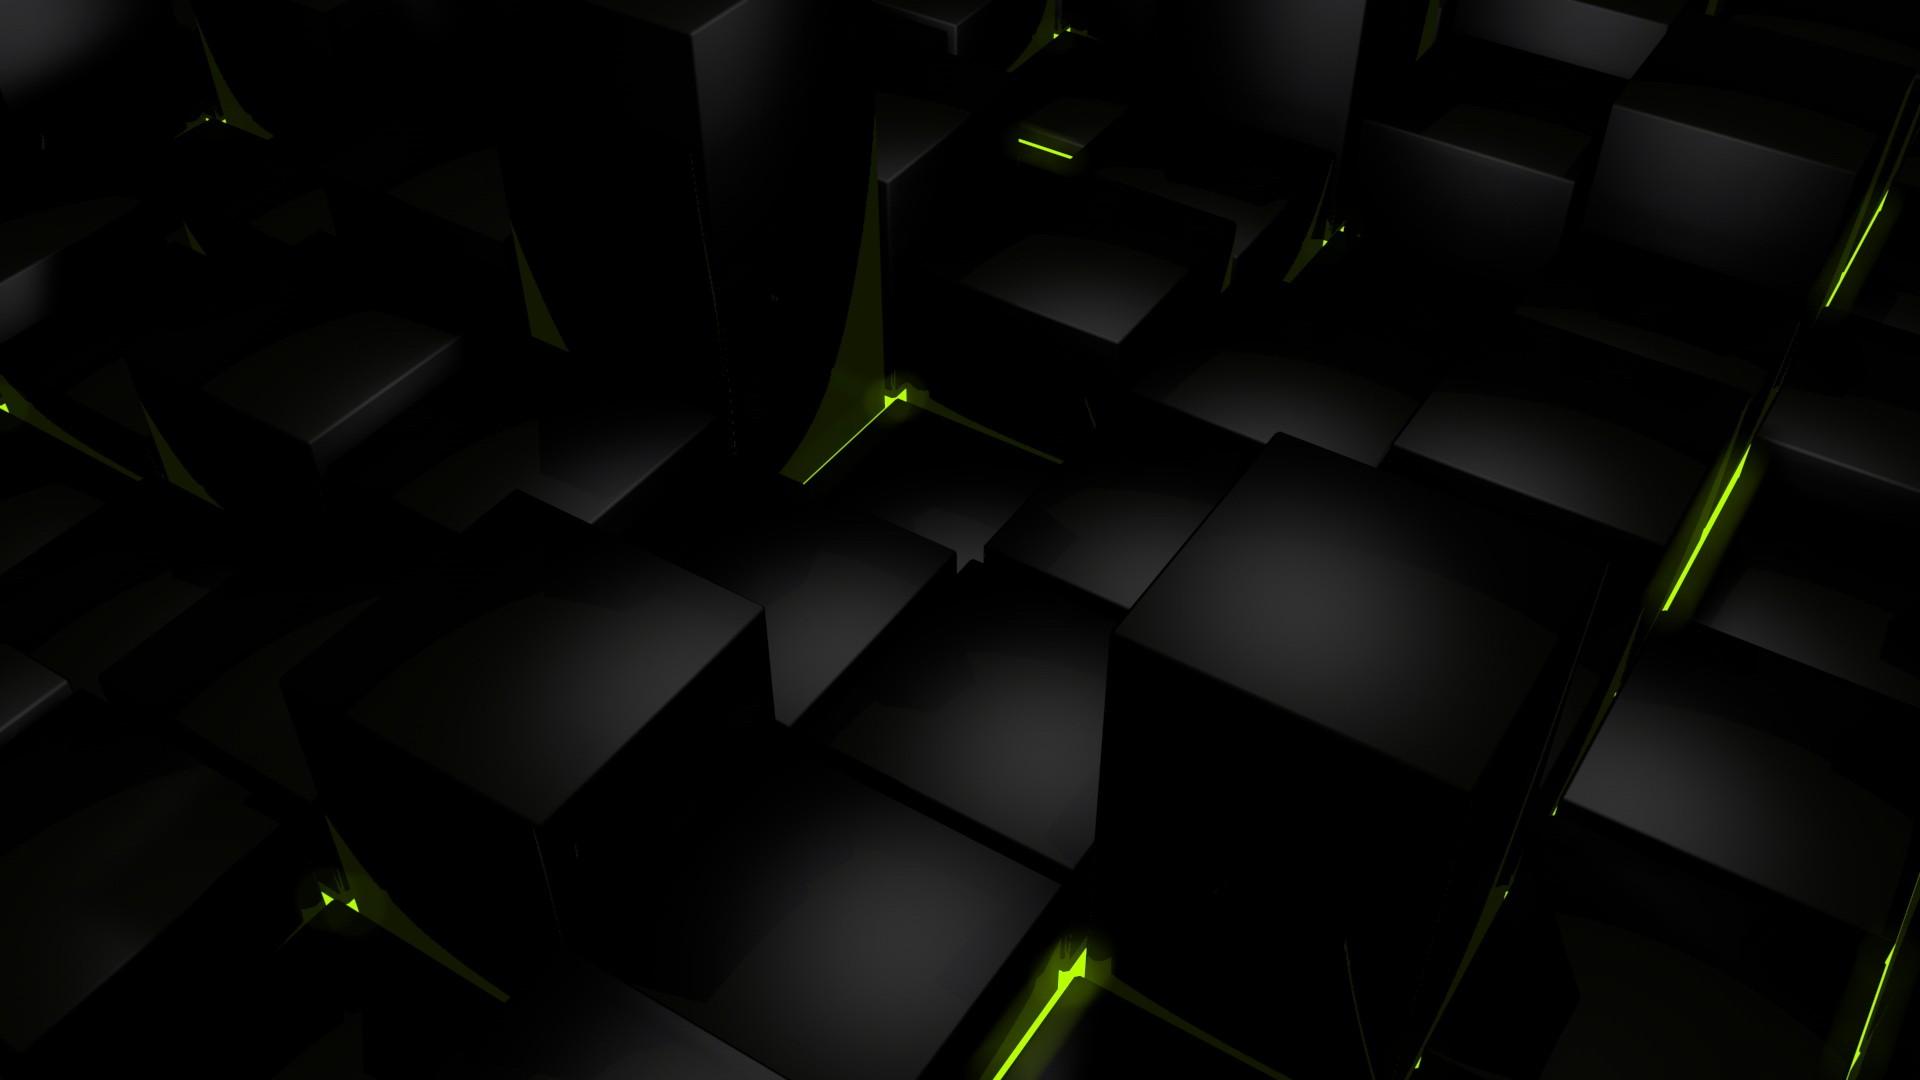 Dark Cubes Glow Computer Graphics Wallpaper 1920x1080